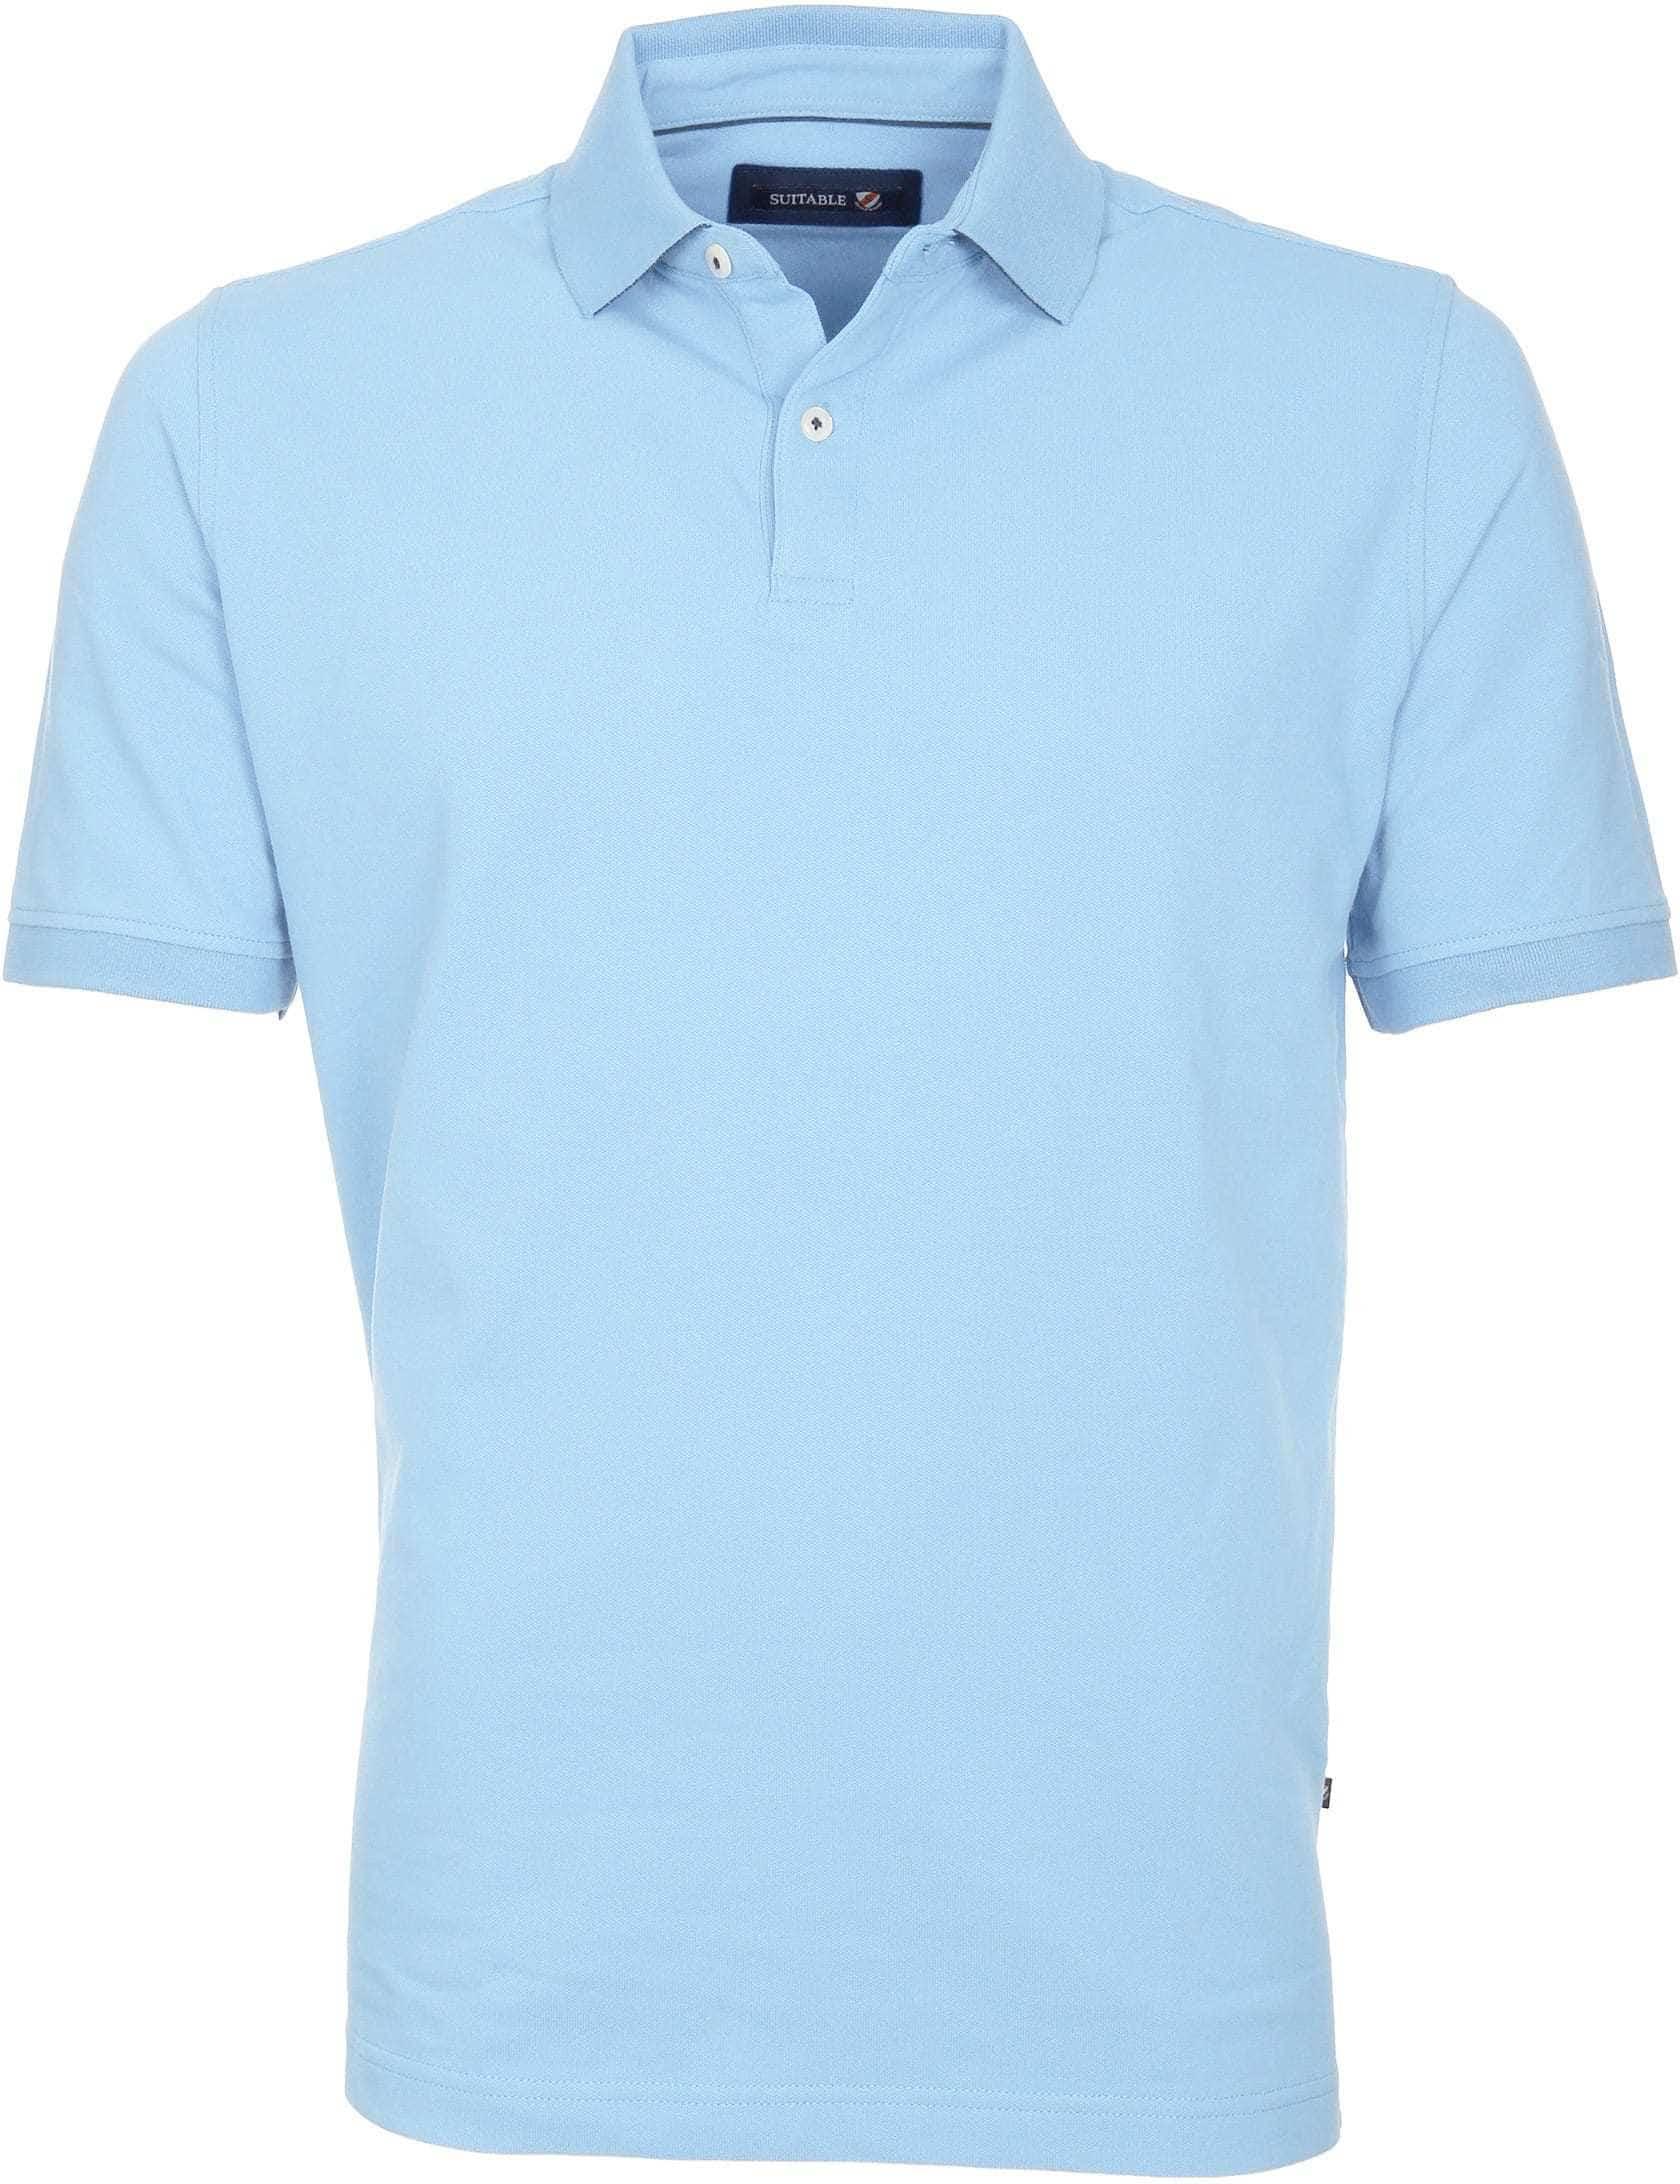 Suitable Polo Basic Lichtblauw foto 0